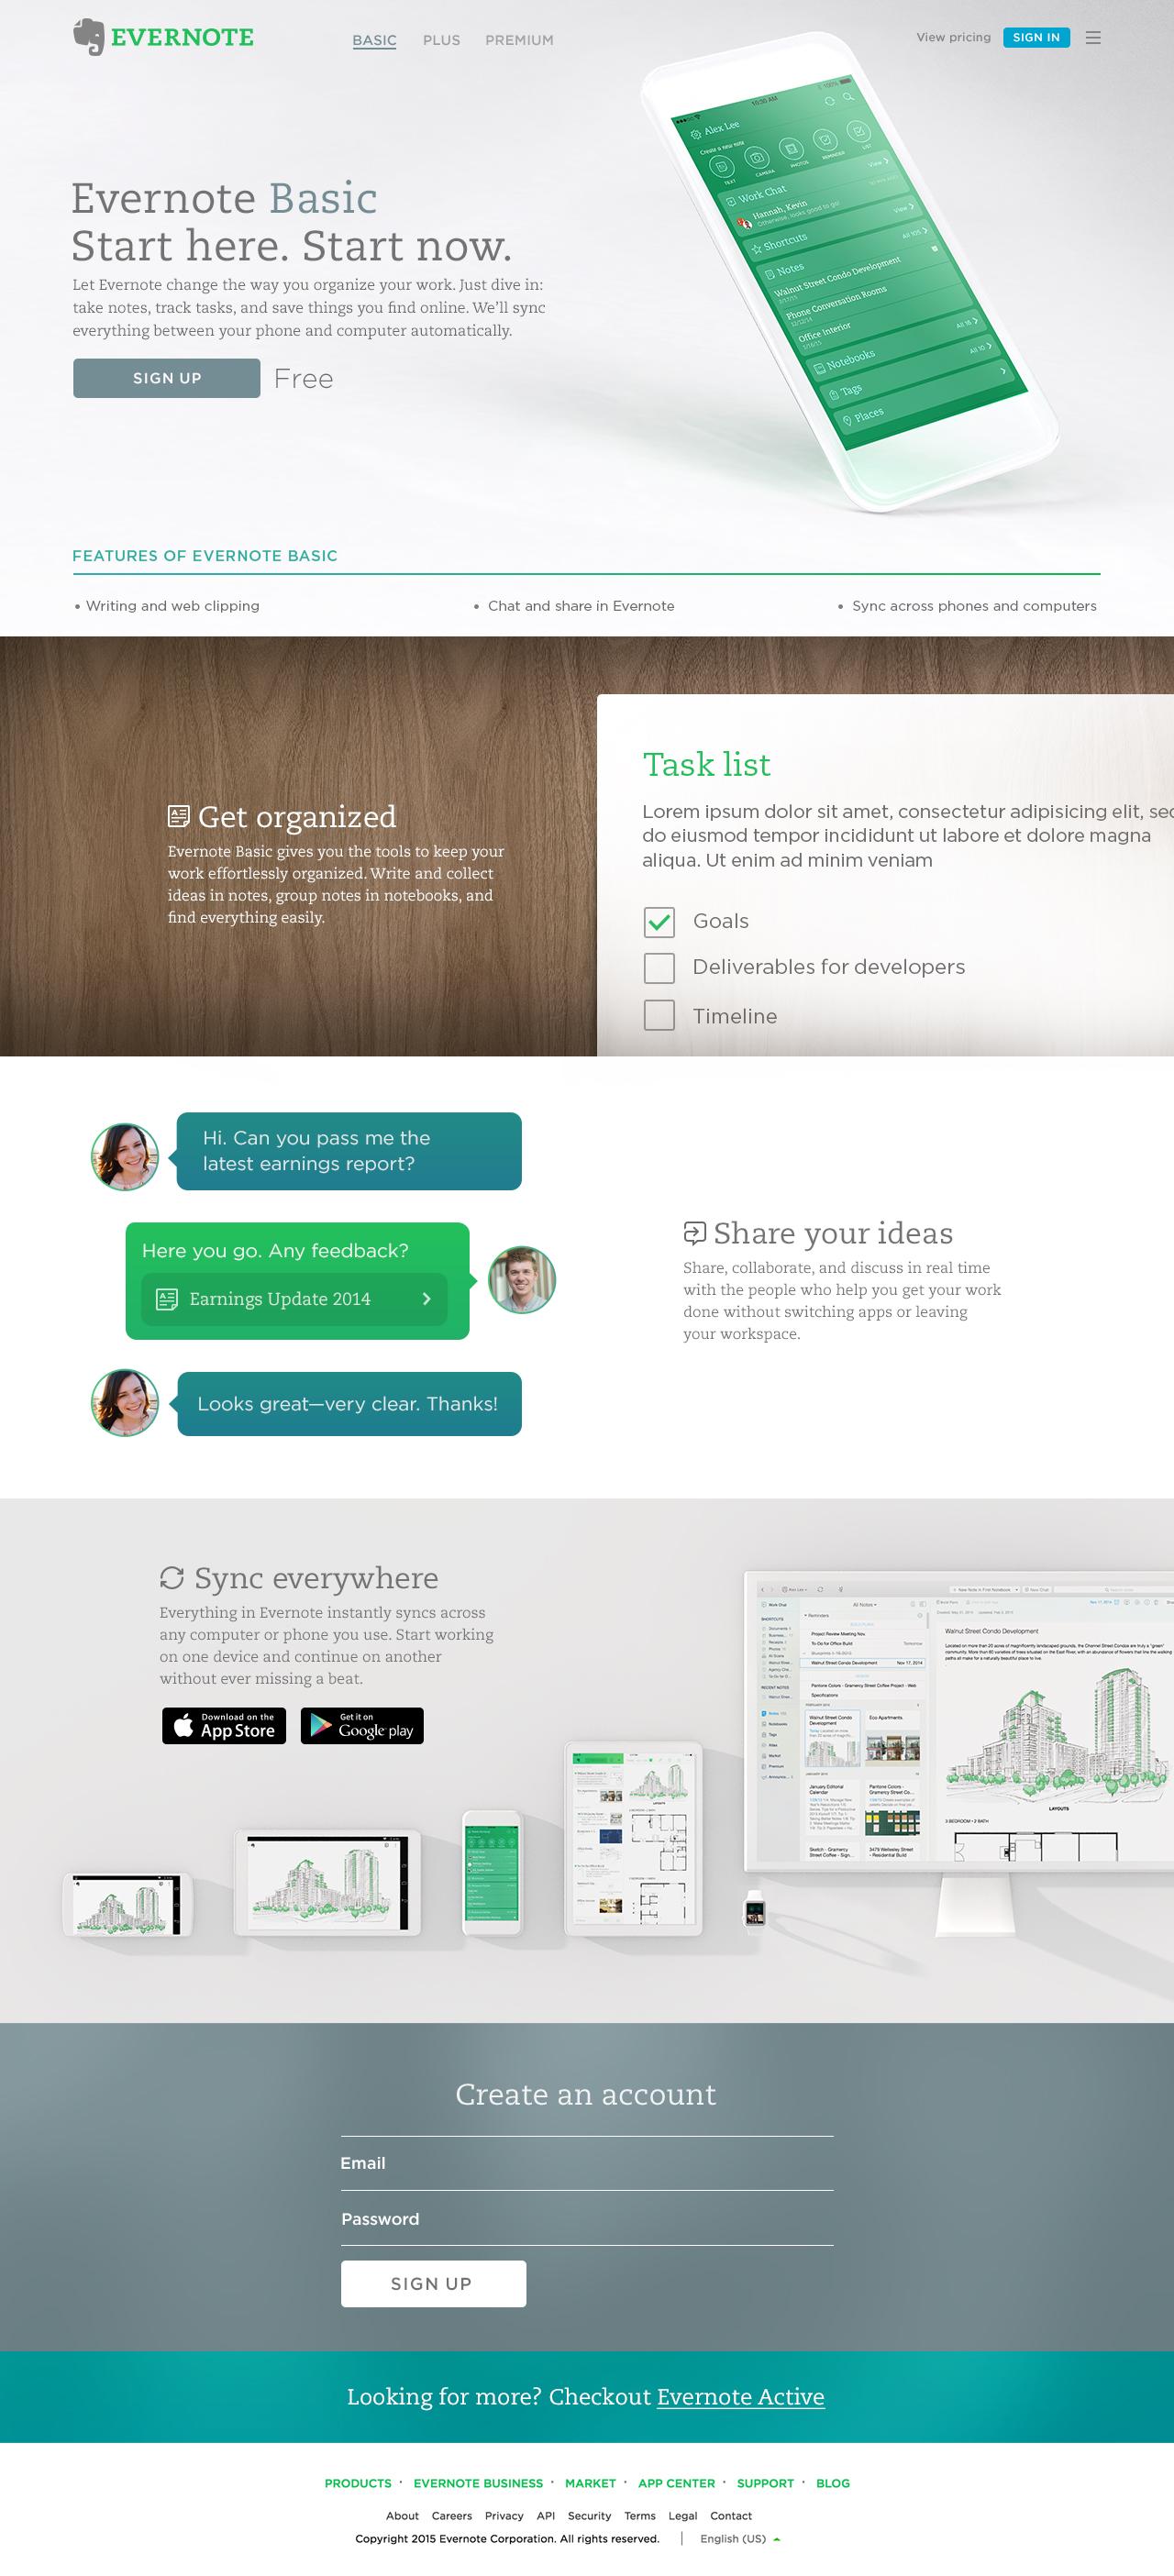 Ev product page basic r3